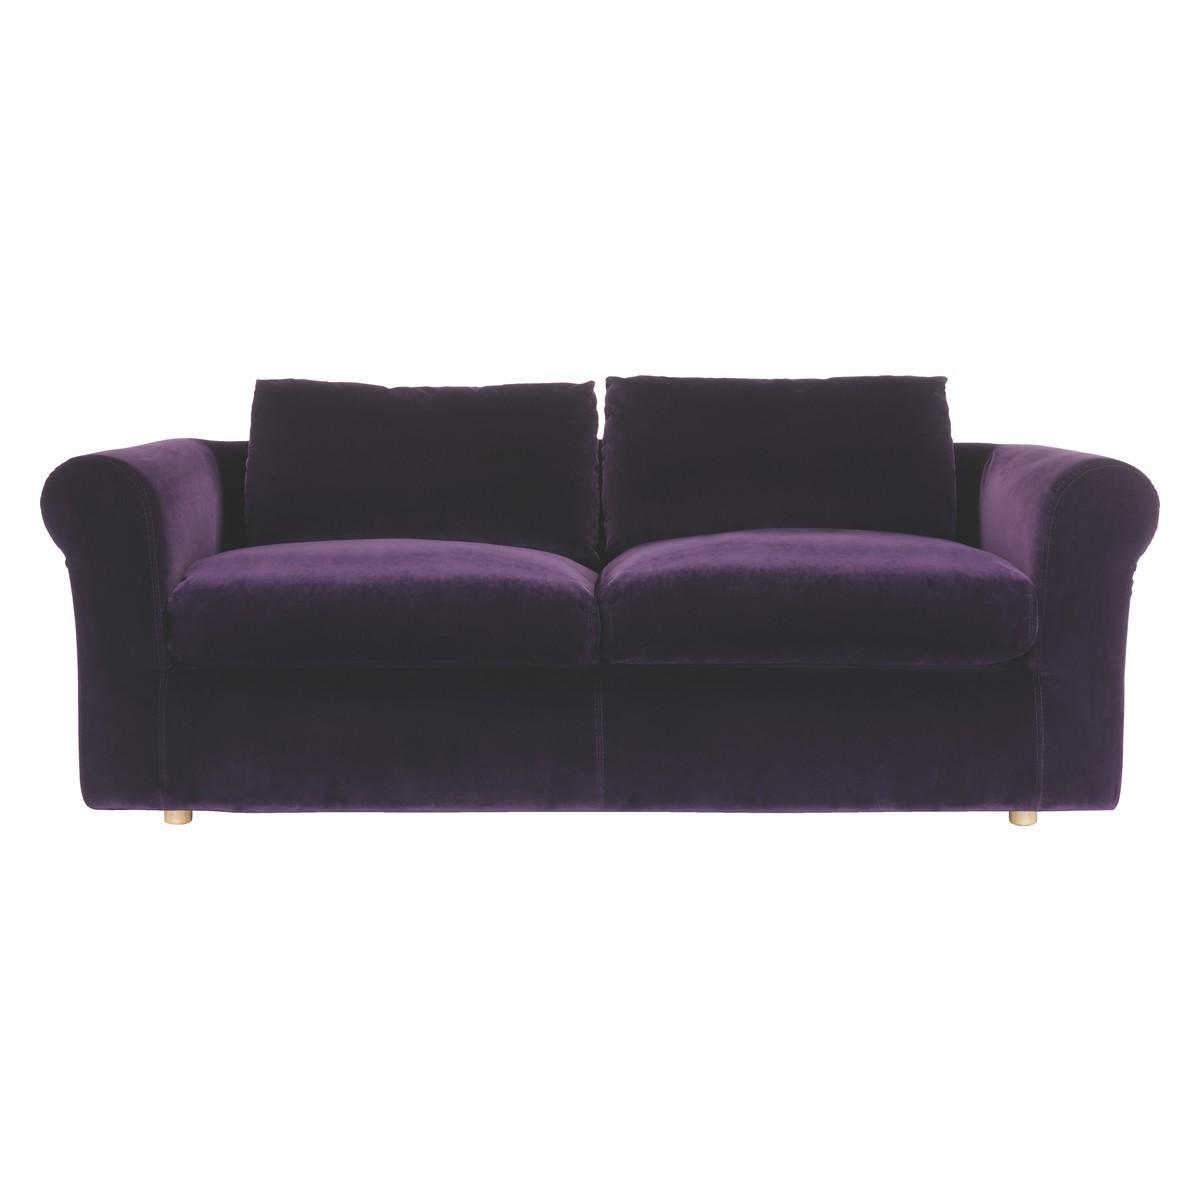 Louis Purple Velvet 3 Seater Sofa | Buy Now At Habitat Uk Regarding Velvet Purple Sofas (View 7 of 20)